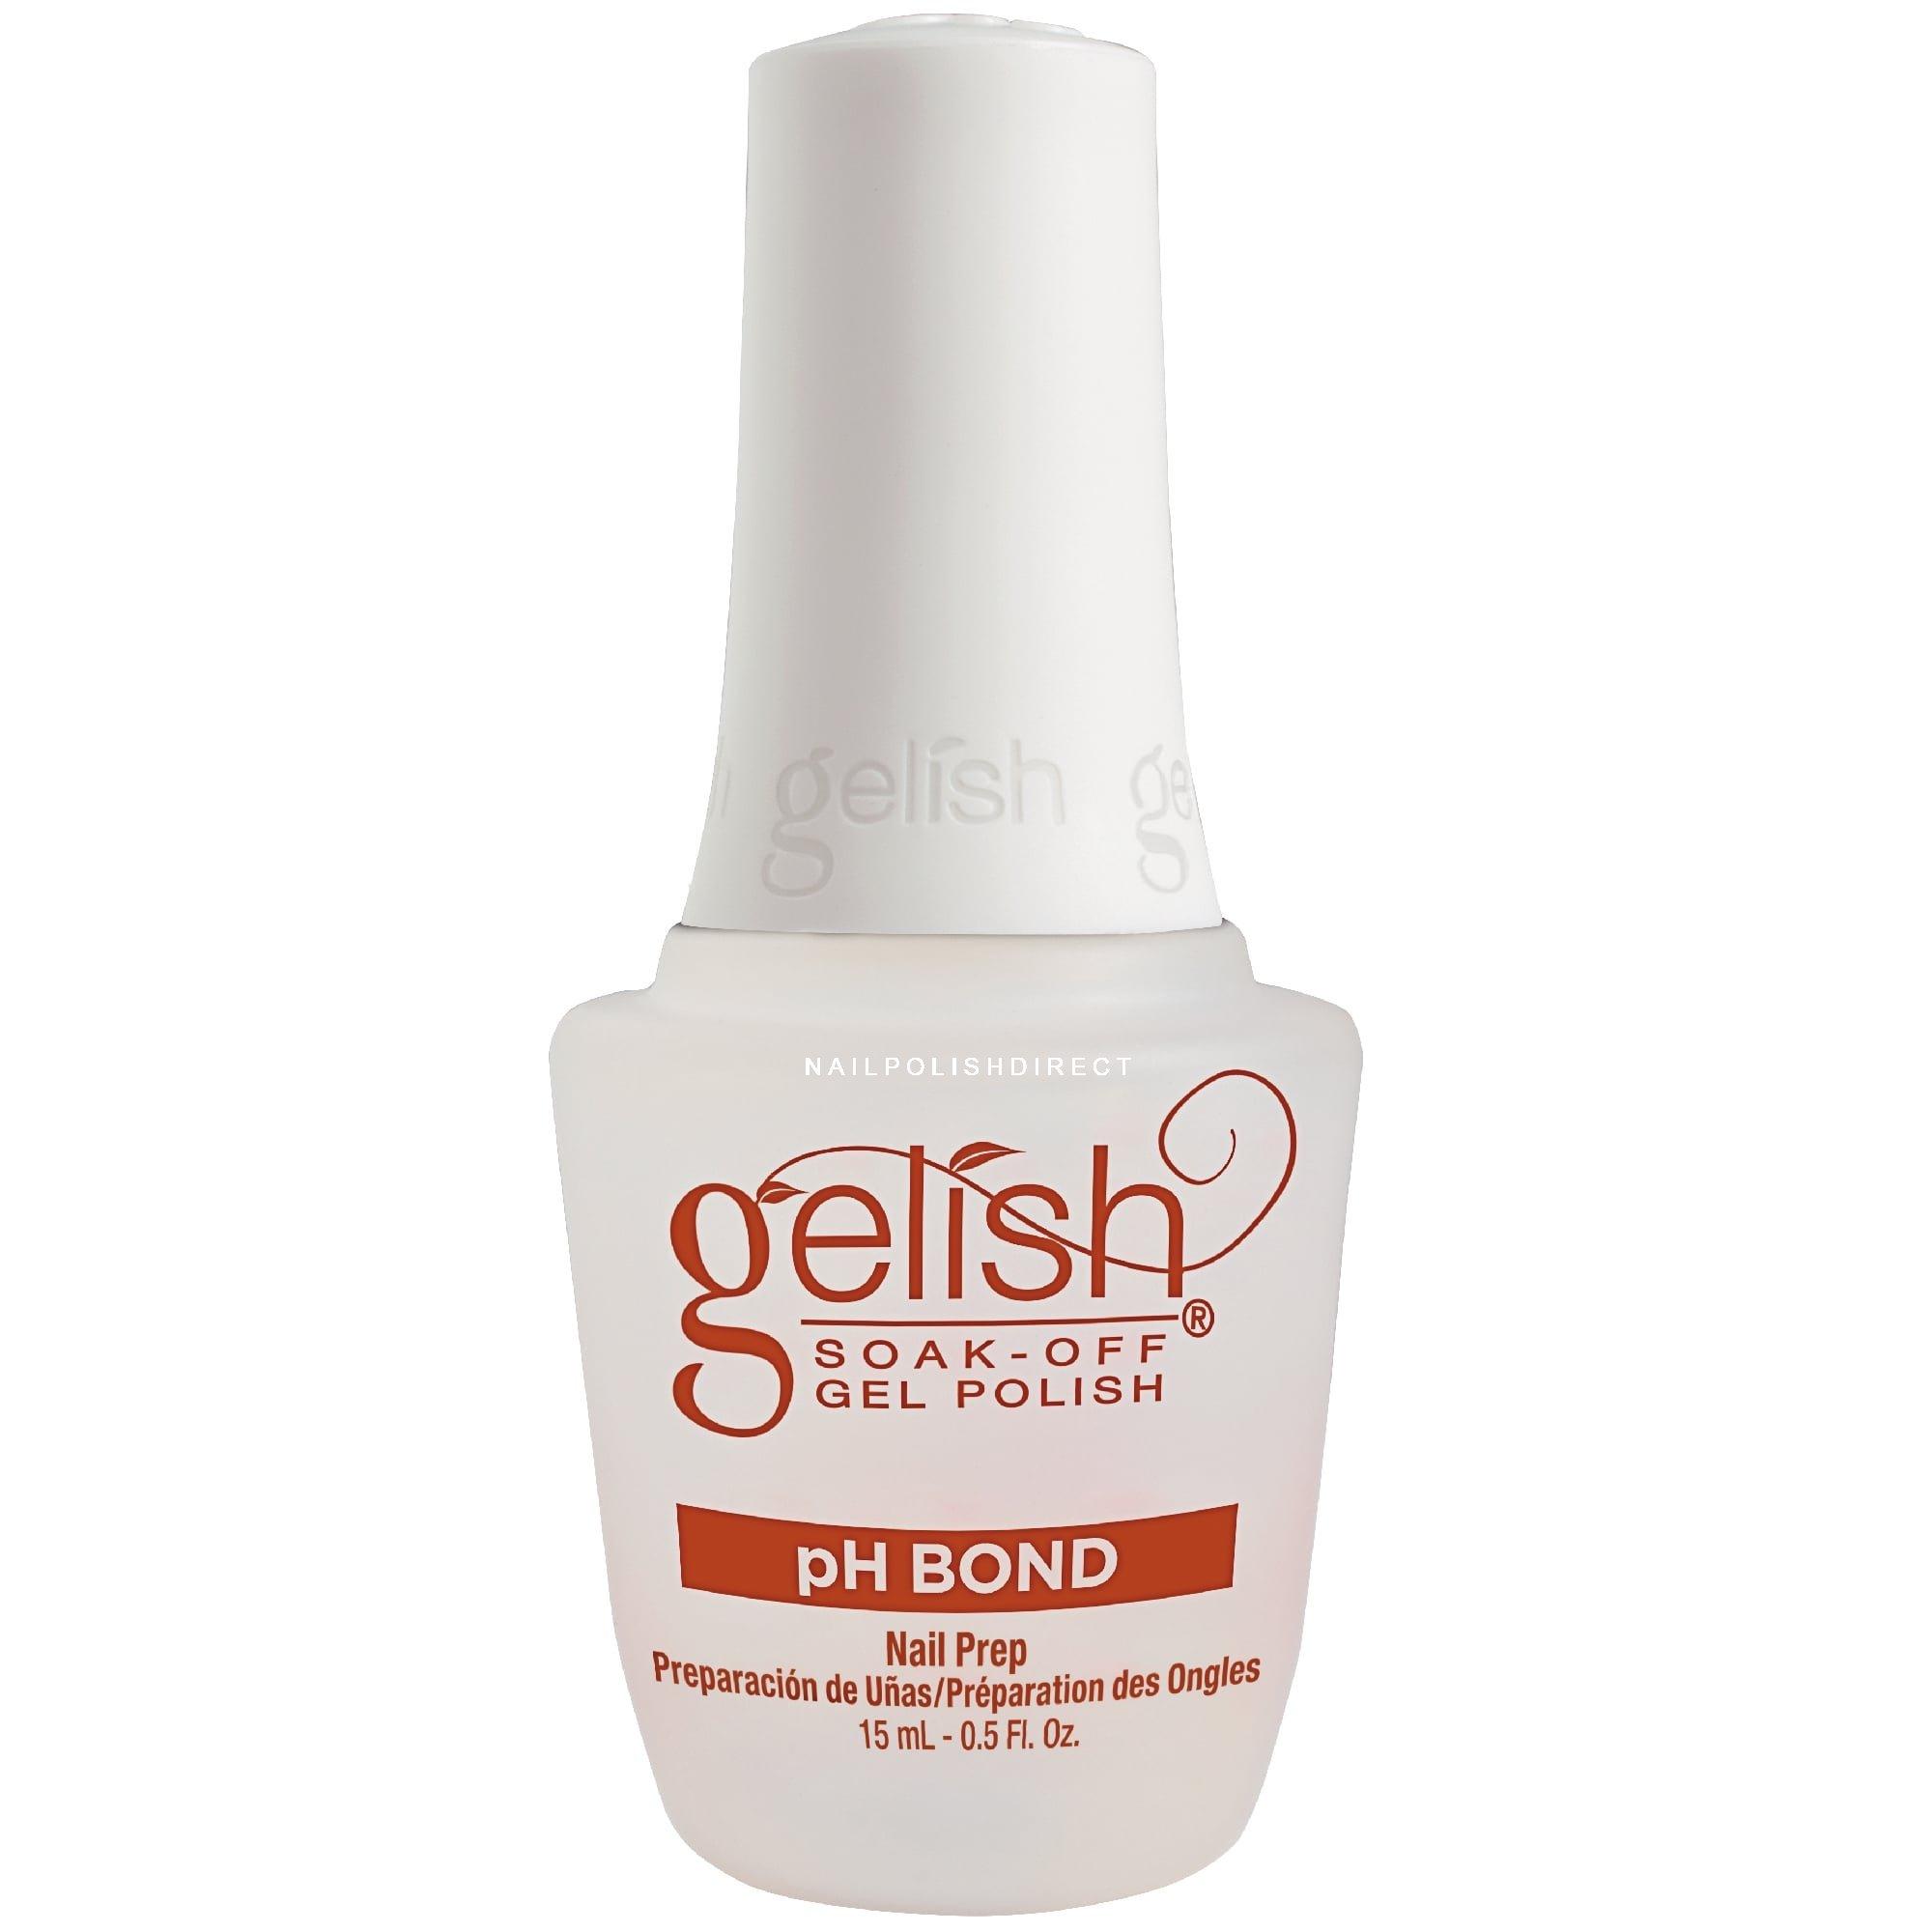 Gelish Soak-Off Gel Nail Polish - pH Bond Dehydrator 15ml